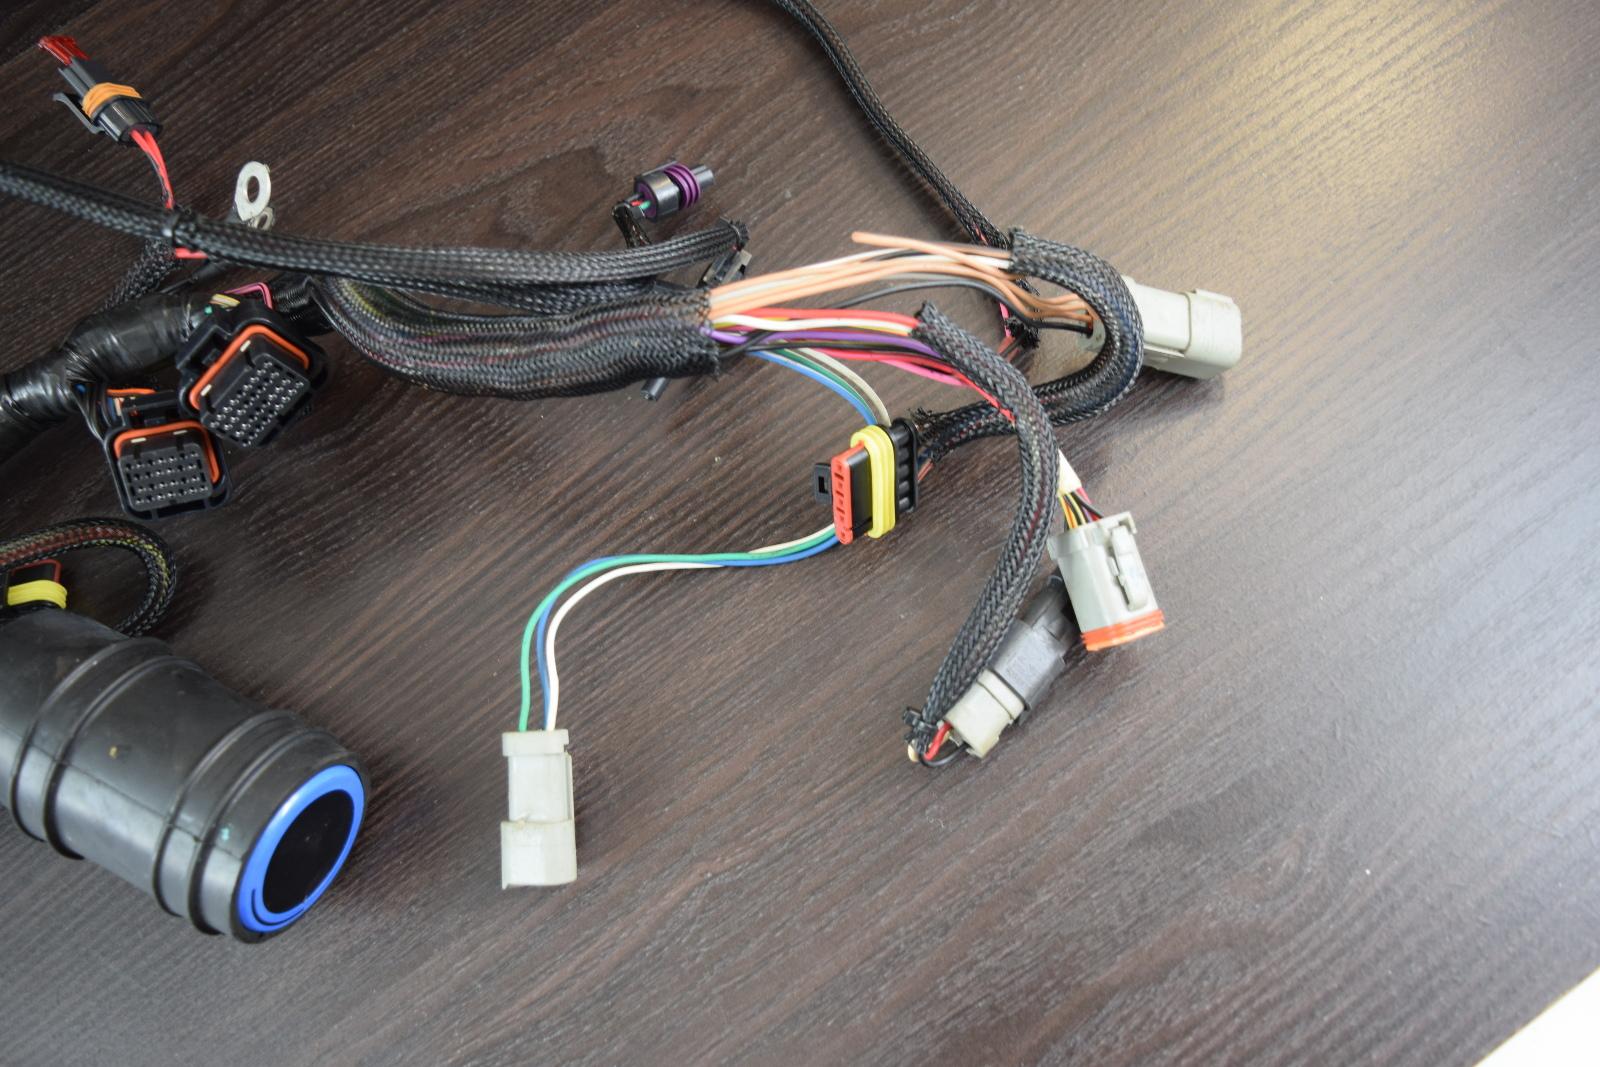 evinrude wire harness nr 5242  evinrude wiring harness connectors wiring diagram  evinrude wiring harness connectors